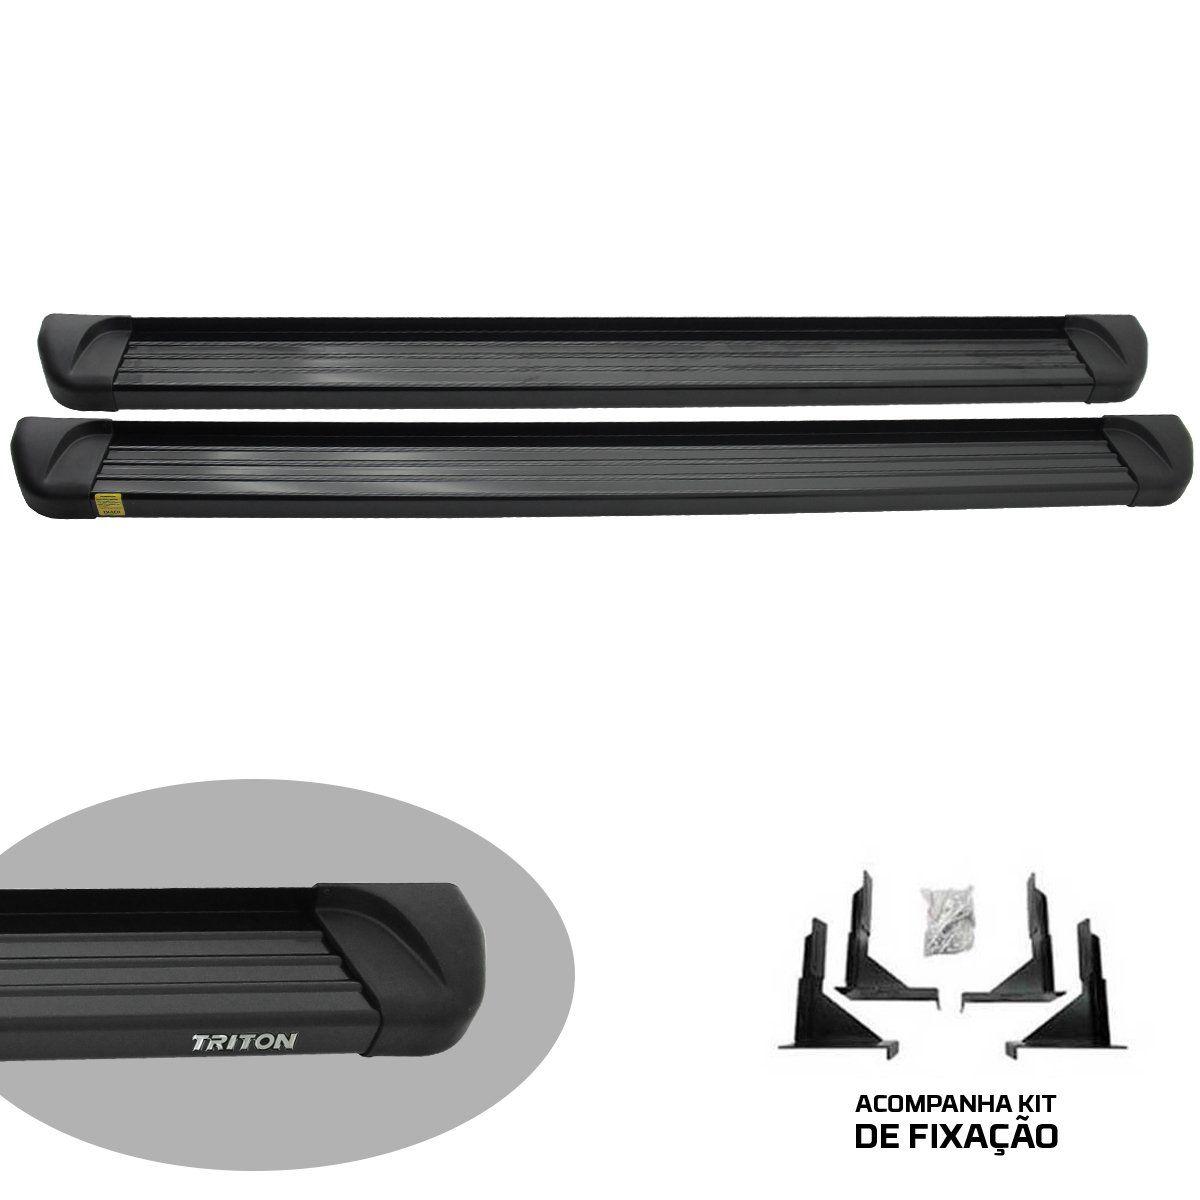 Estribo plataforma alumínio preto L200 Triton 2008 a 2016